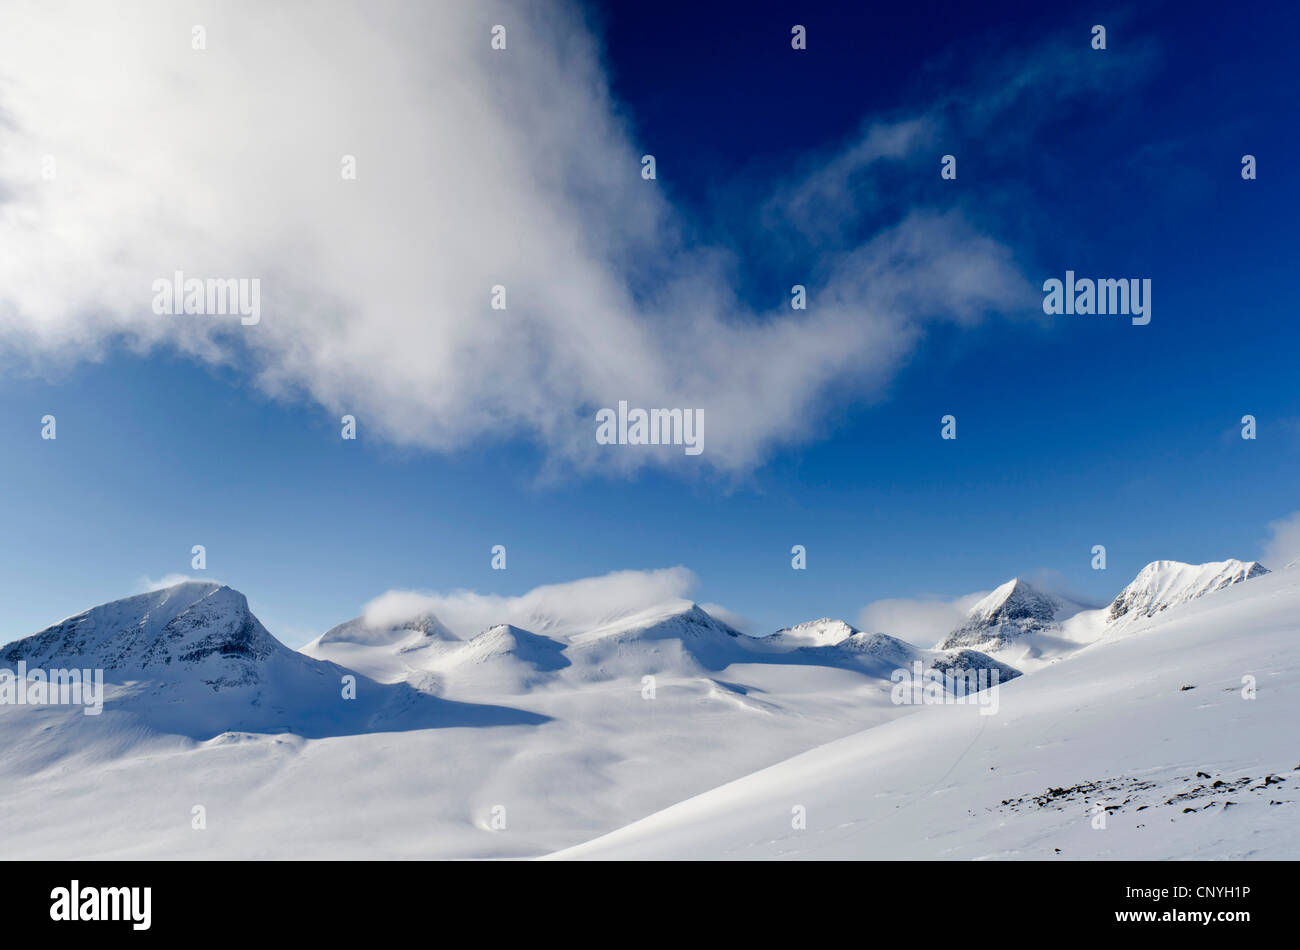 Tjaektja Joka mountain range and Stuor Reaiddavaggi, Kebnekaise Fell, Sweden, Lapland, Norrbotten - Stock Image